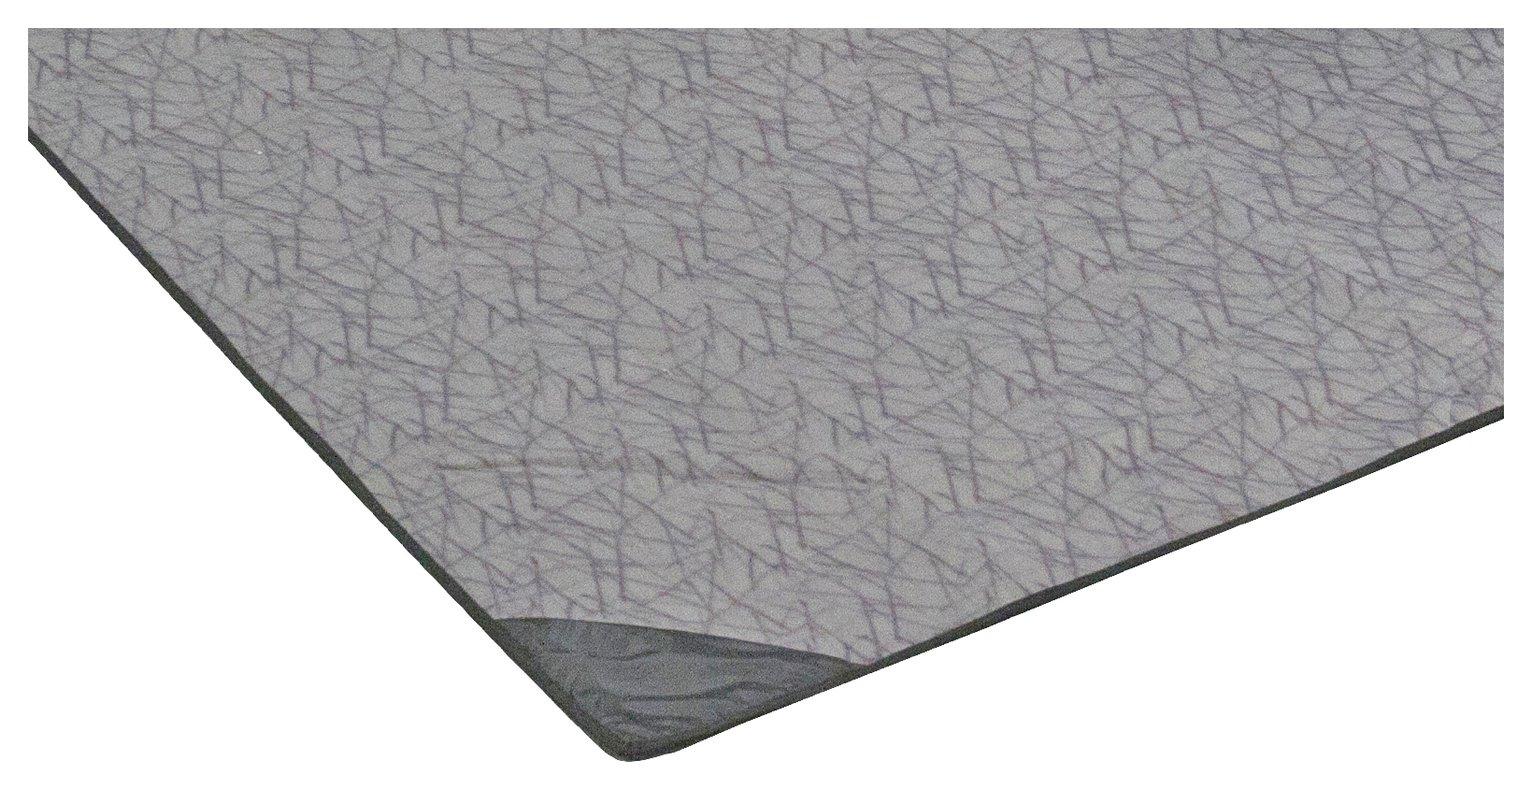 Vango Universal Tent Carpet - 2.6 x 3.6 m